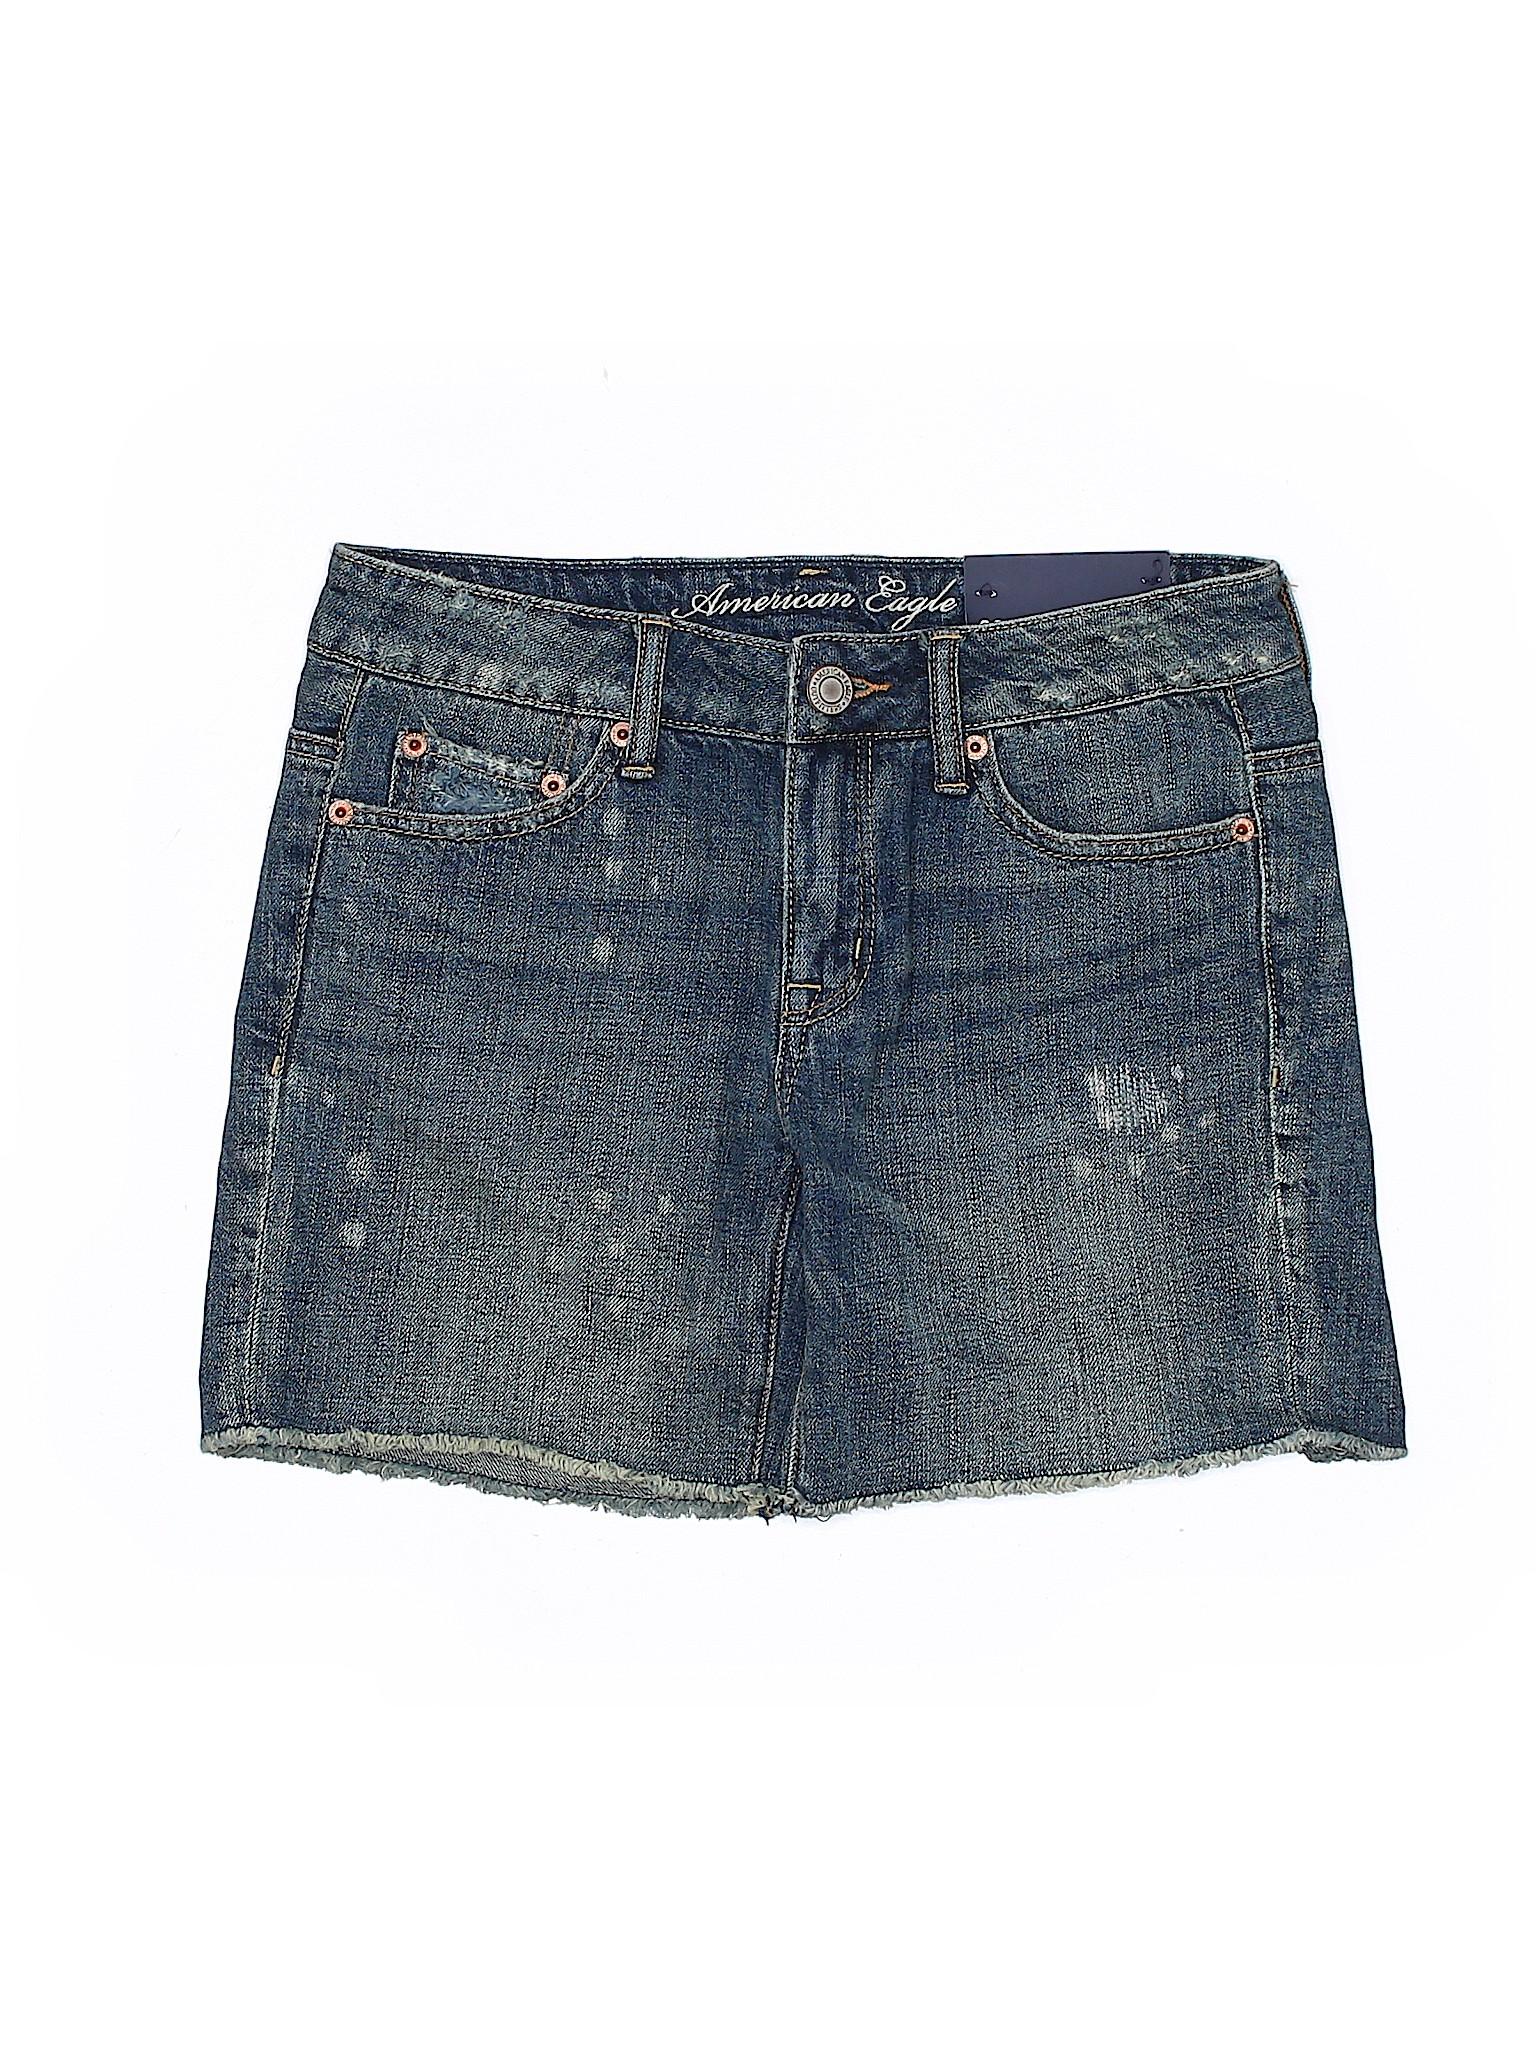 Leisure Shorts Eagle Boutique Denim Outfitters American dWTndOpq7